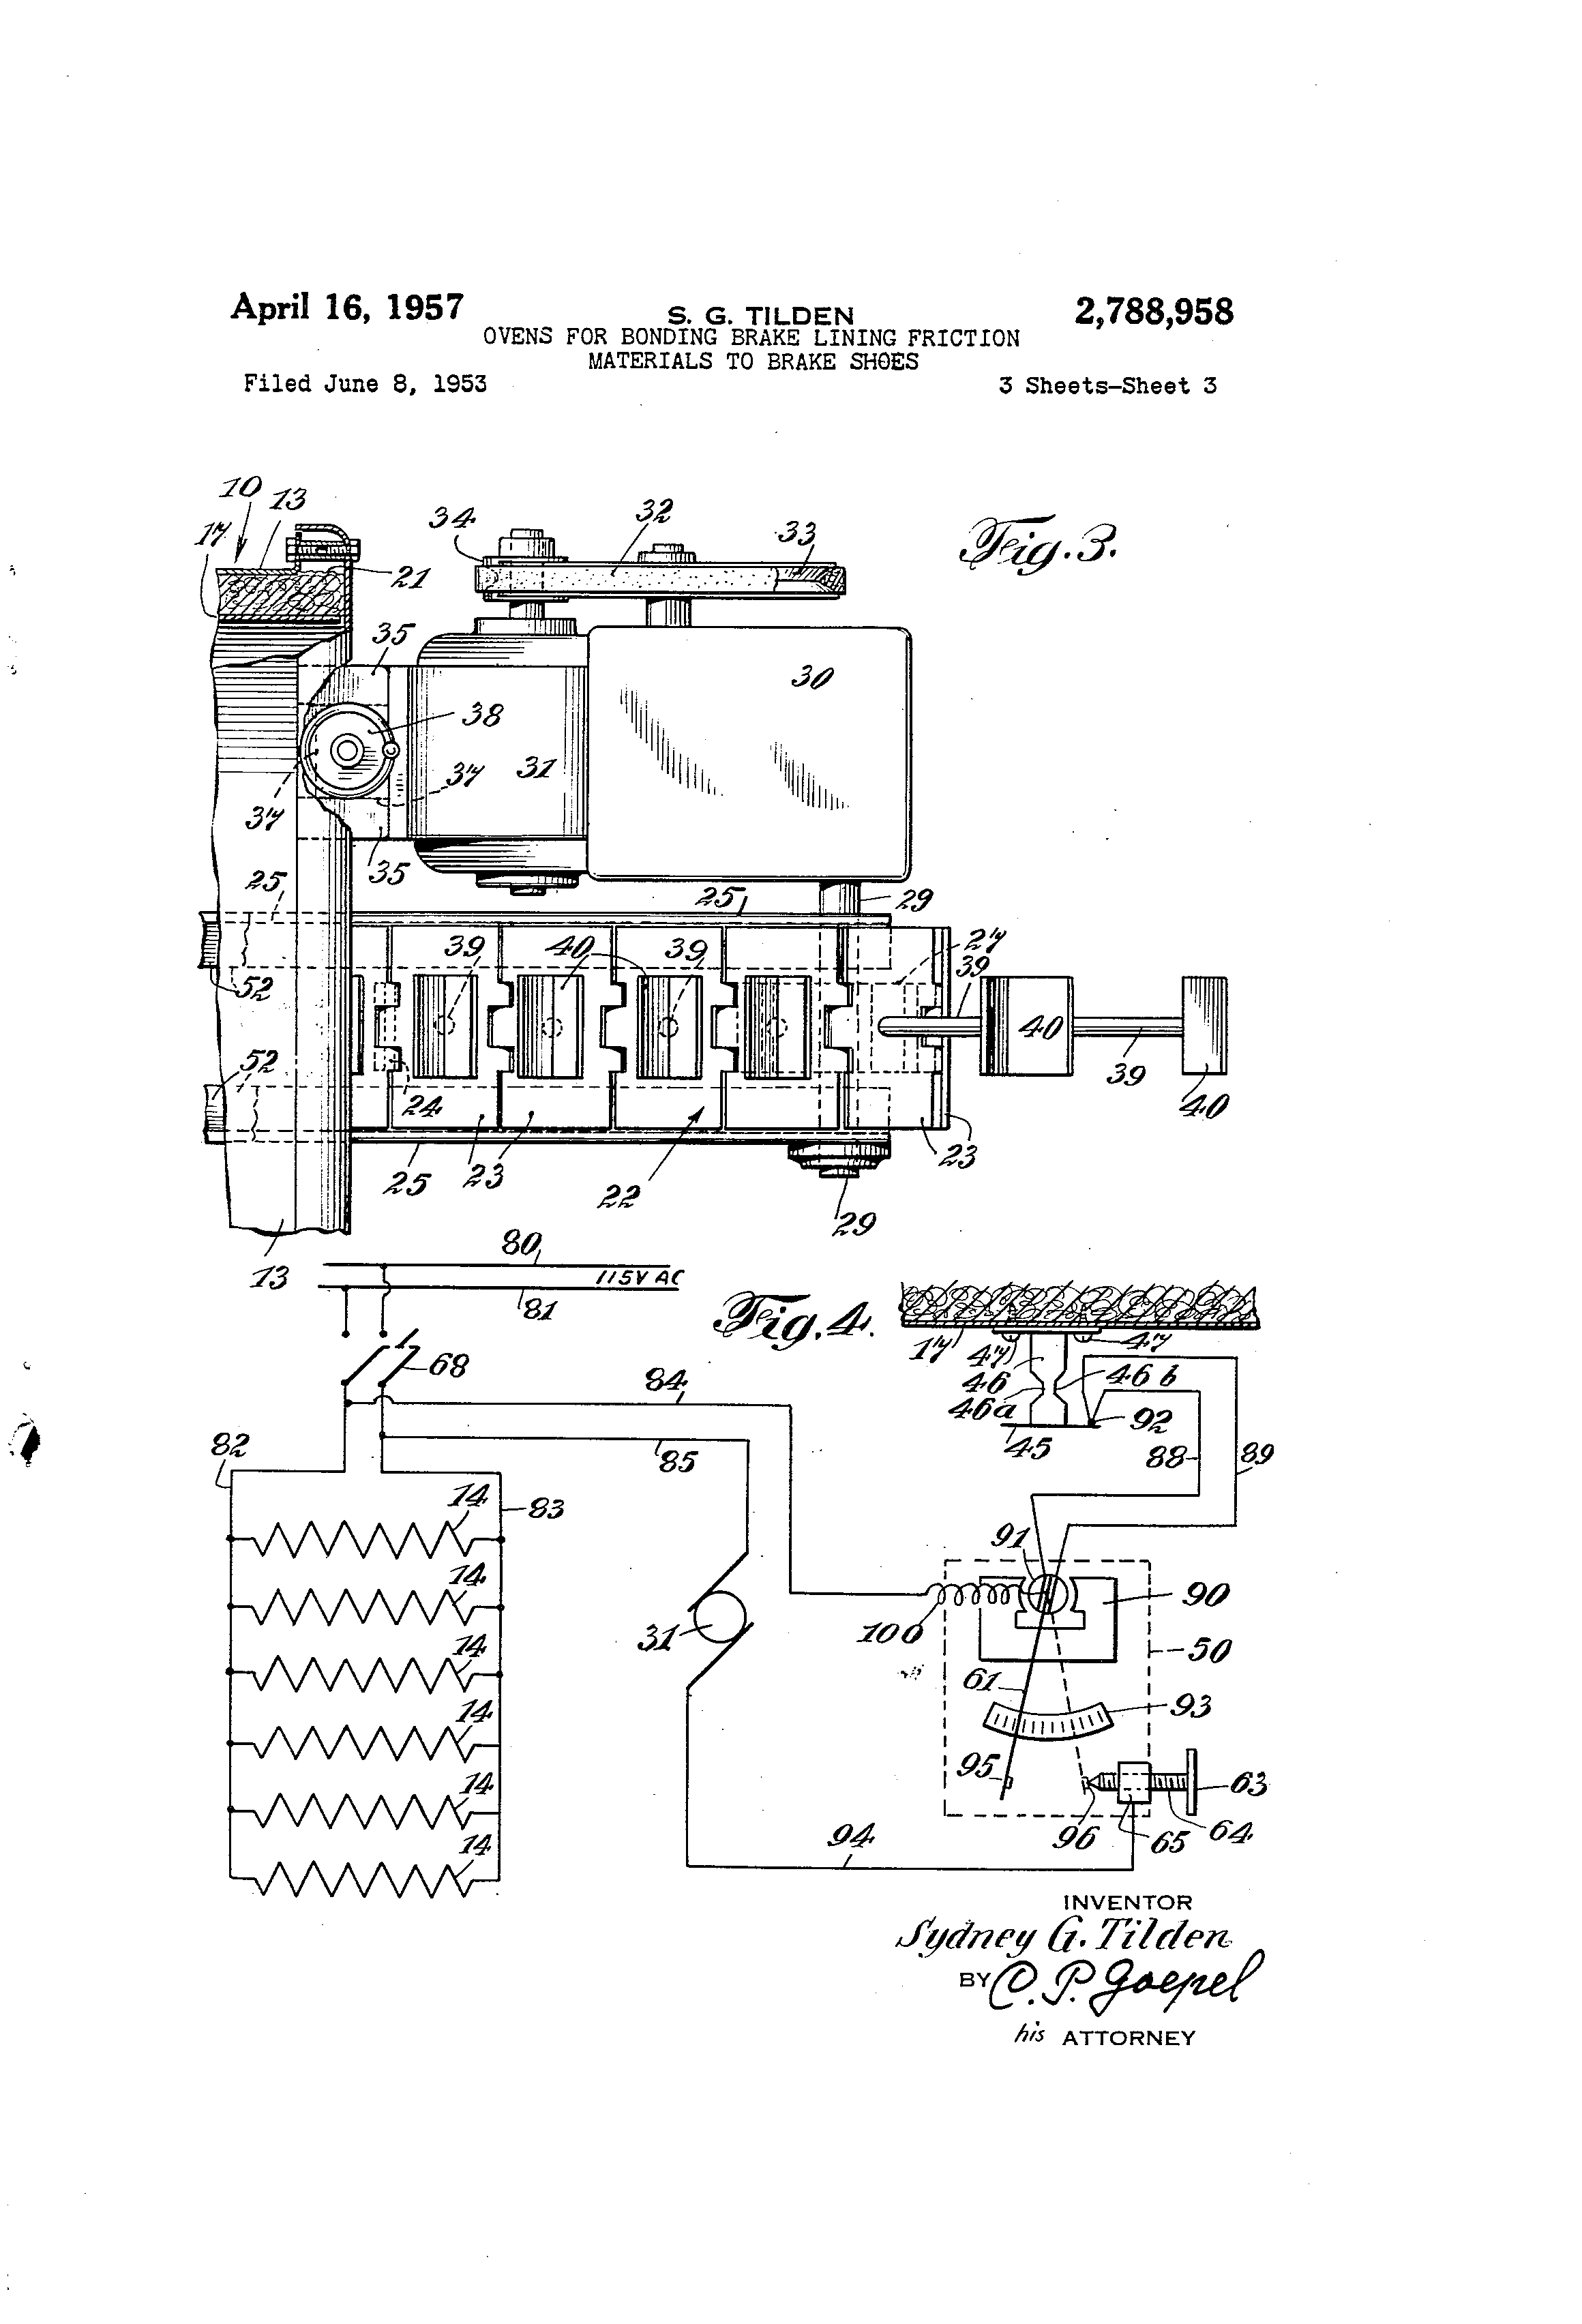 Brake Lining Draw : Patent us ovens for bonding brake lining friction